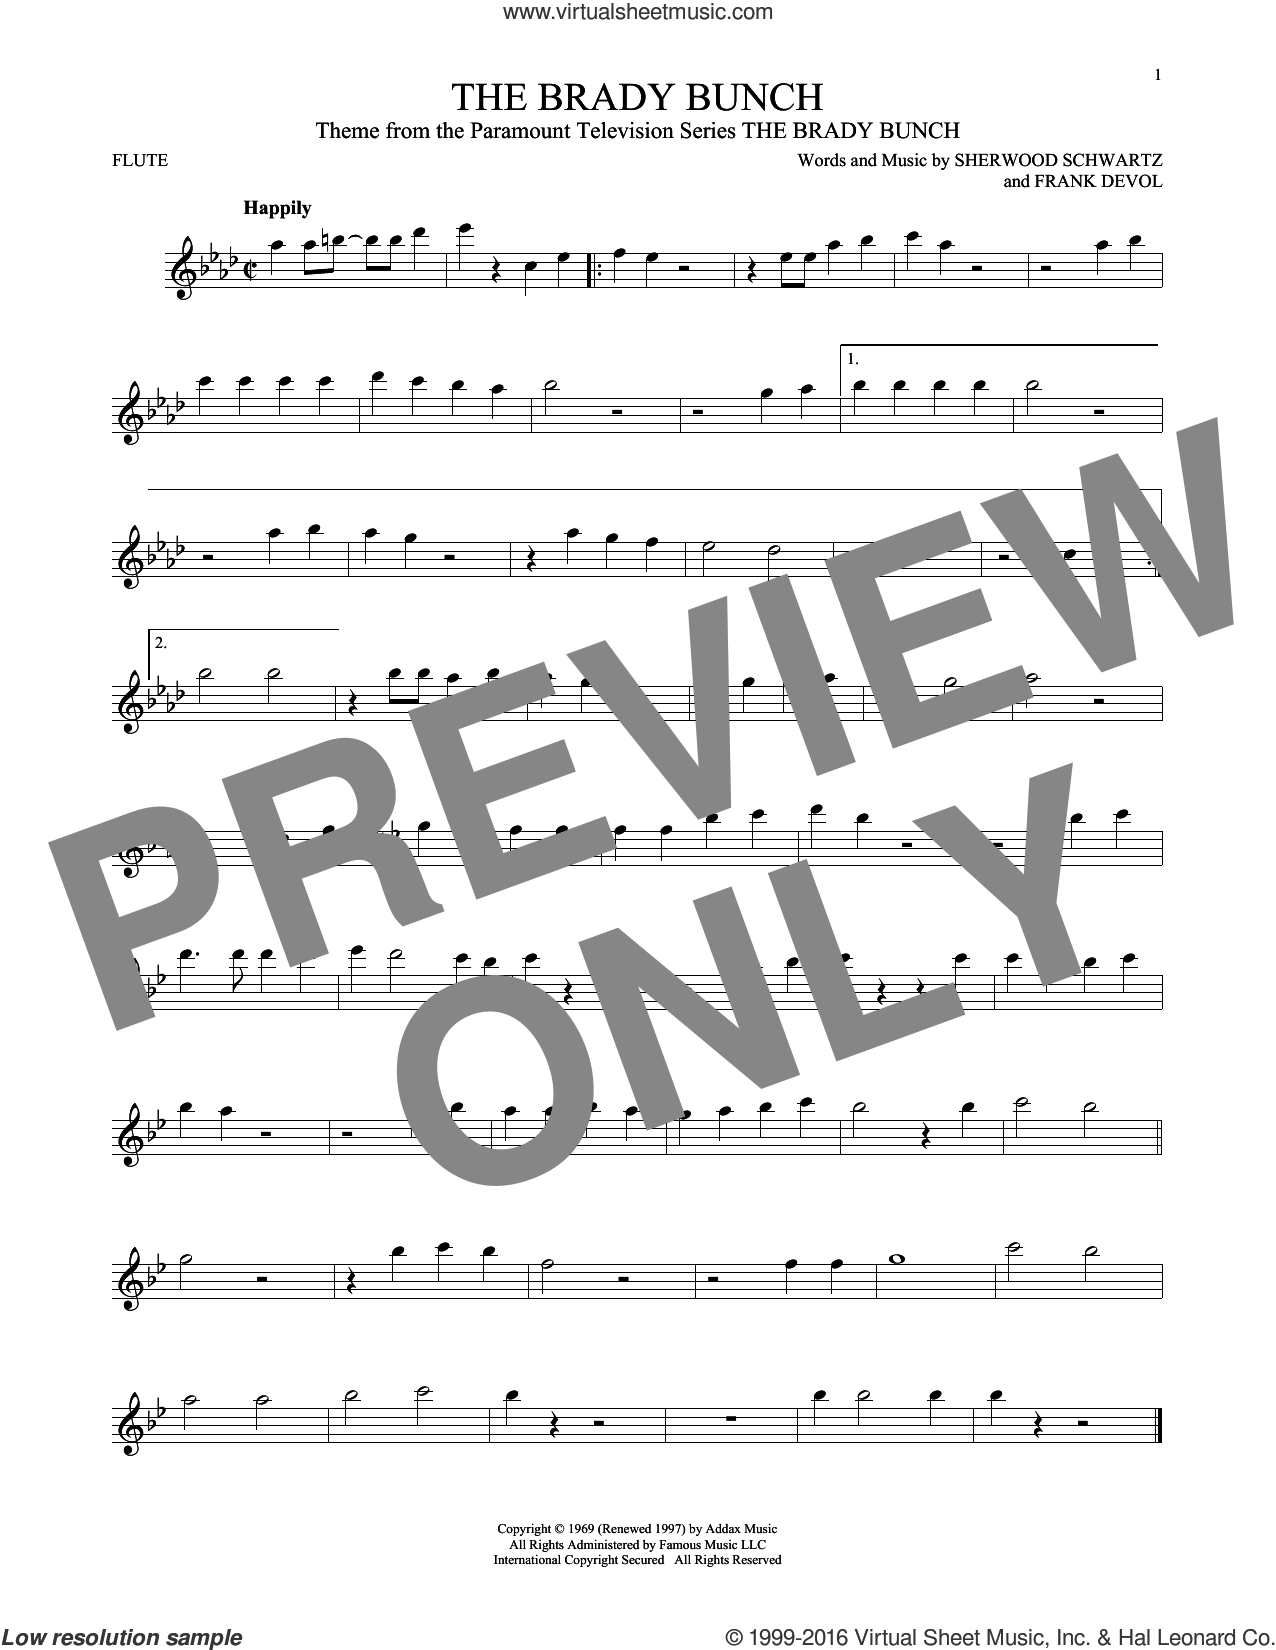 The Brady Bunch sheet music for flute solo by Frank DeVol and Sherwood Schwartz, intermediate skill level